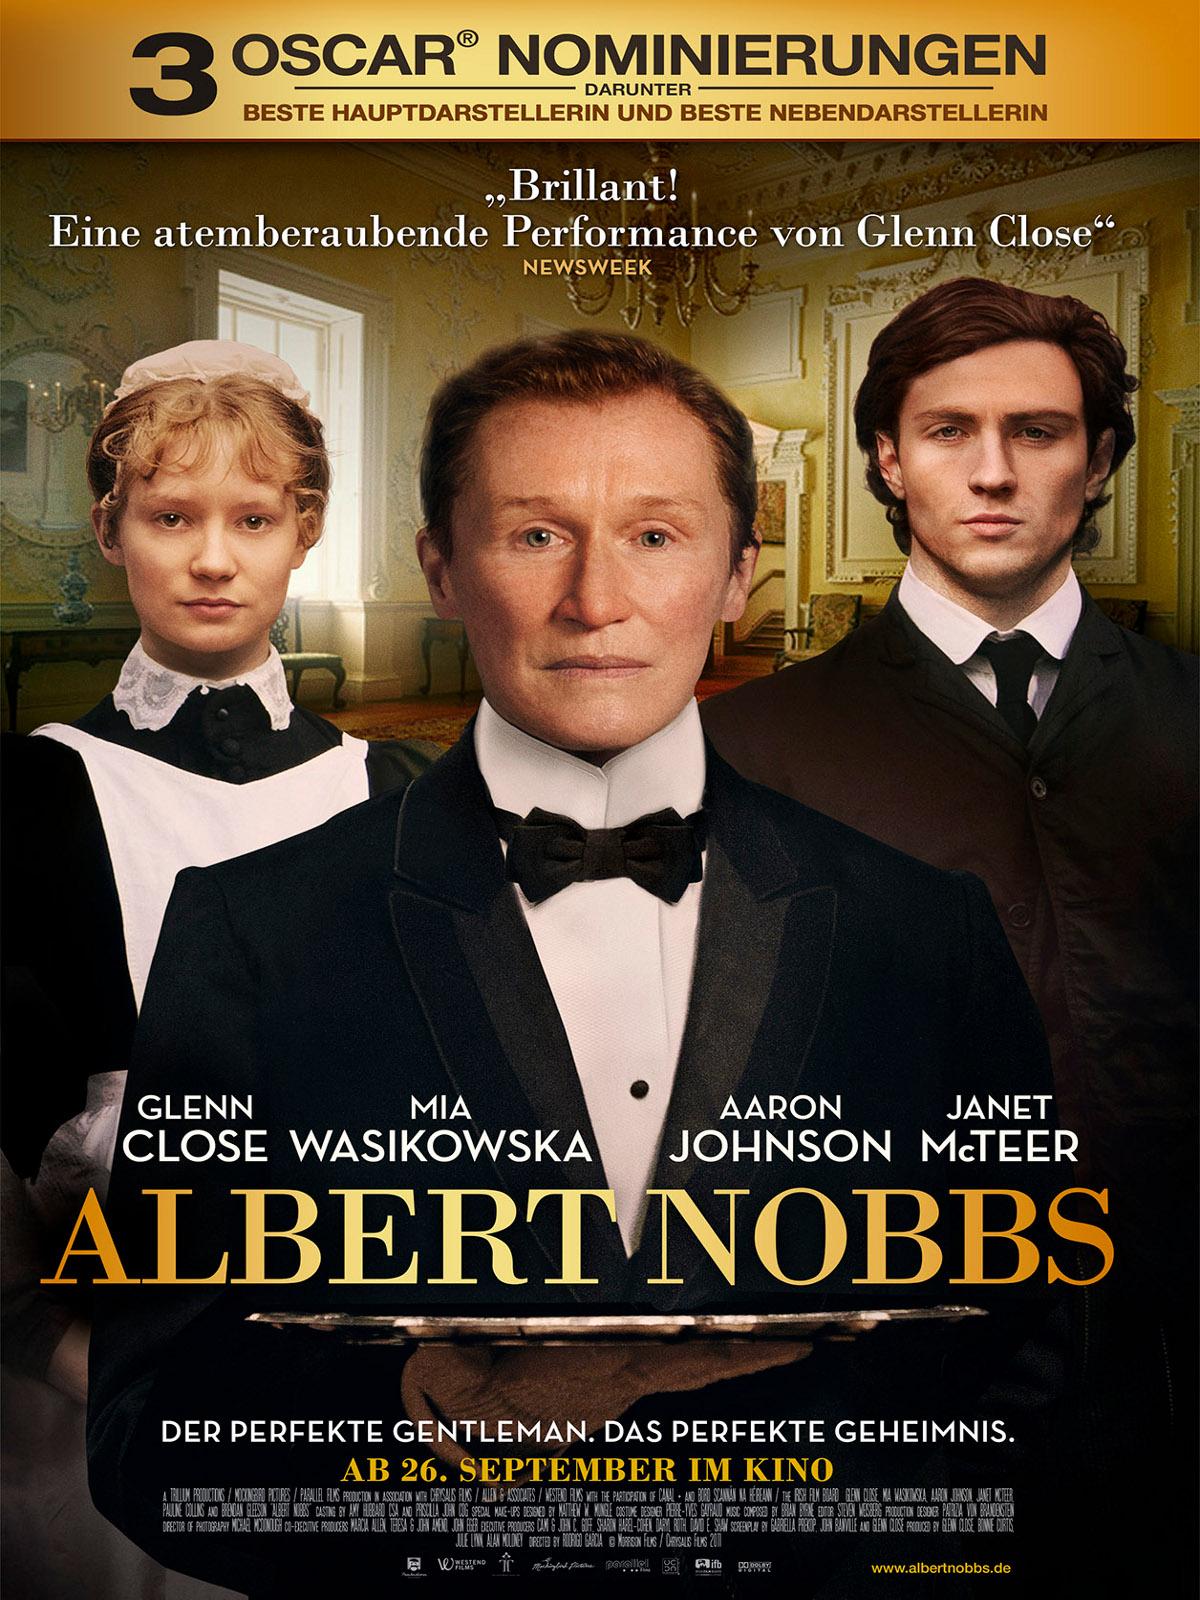 Albert Nobbs Movie Review & Film Summary (2012 ... - Roger ...